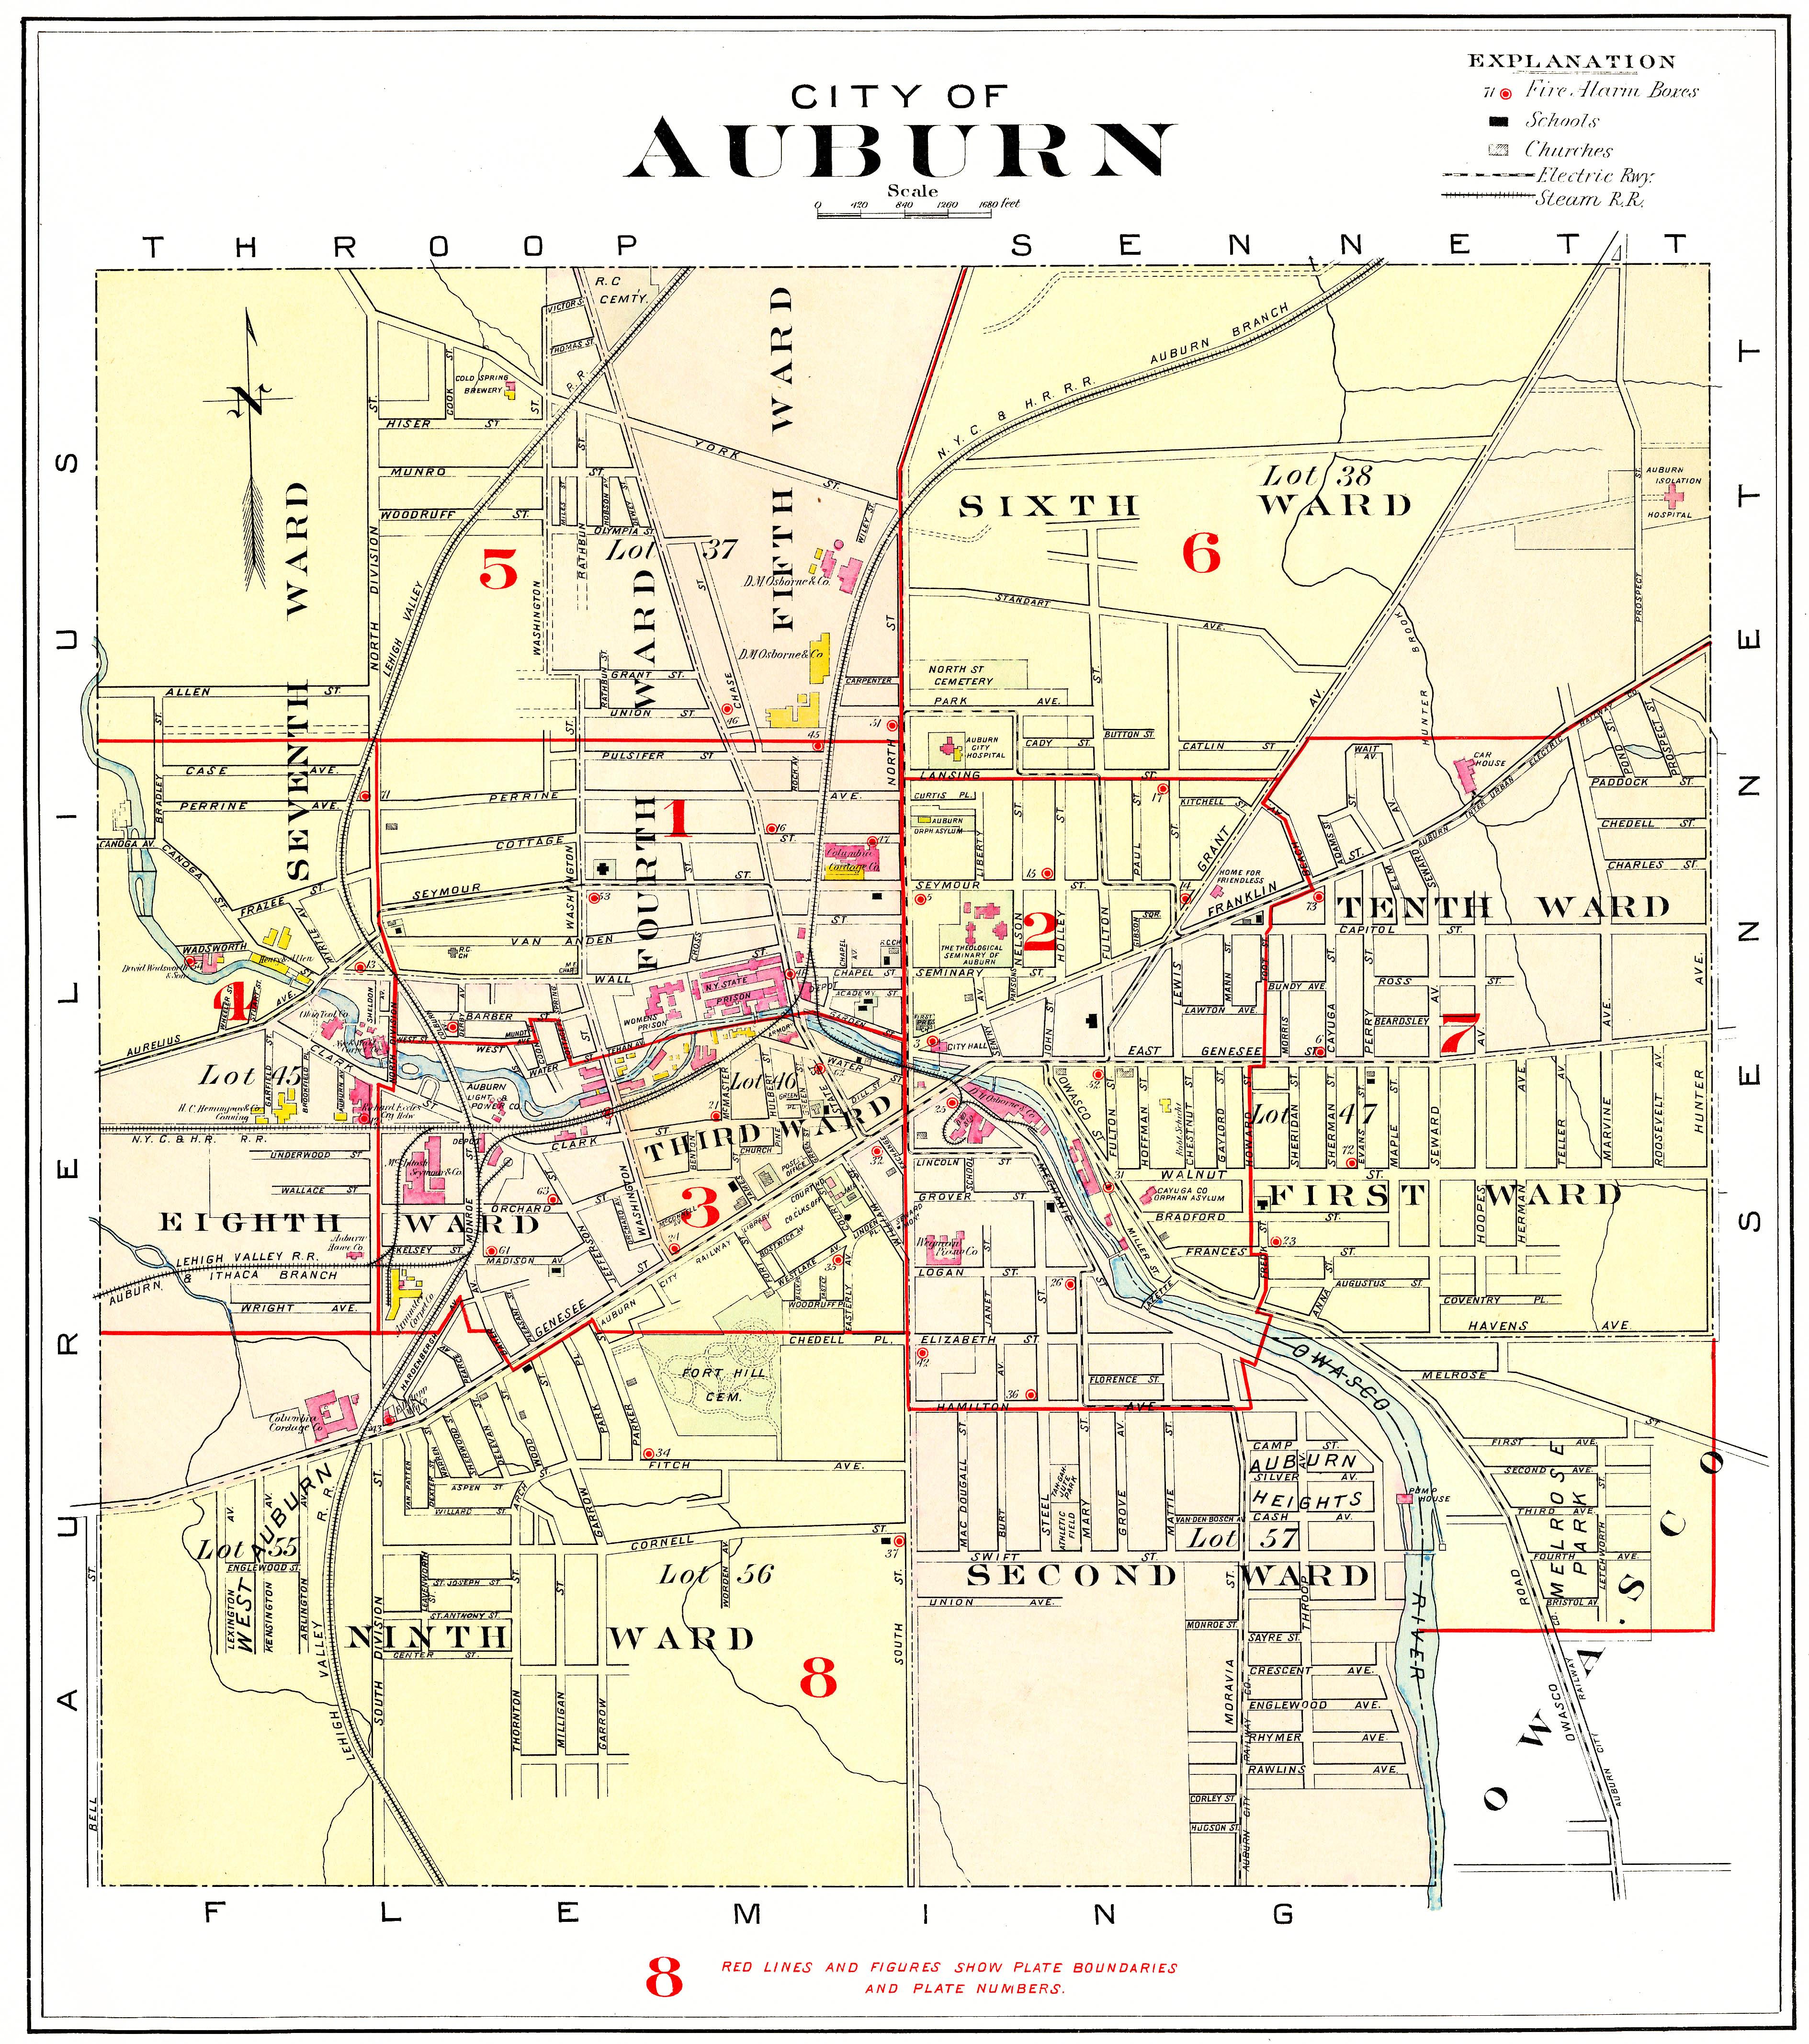 New york cayuga county - City Of Auburn 2 5x